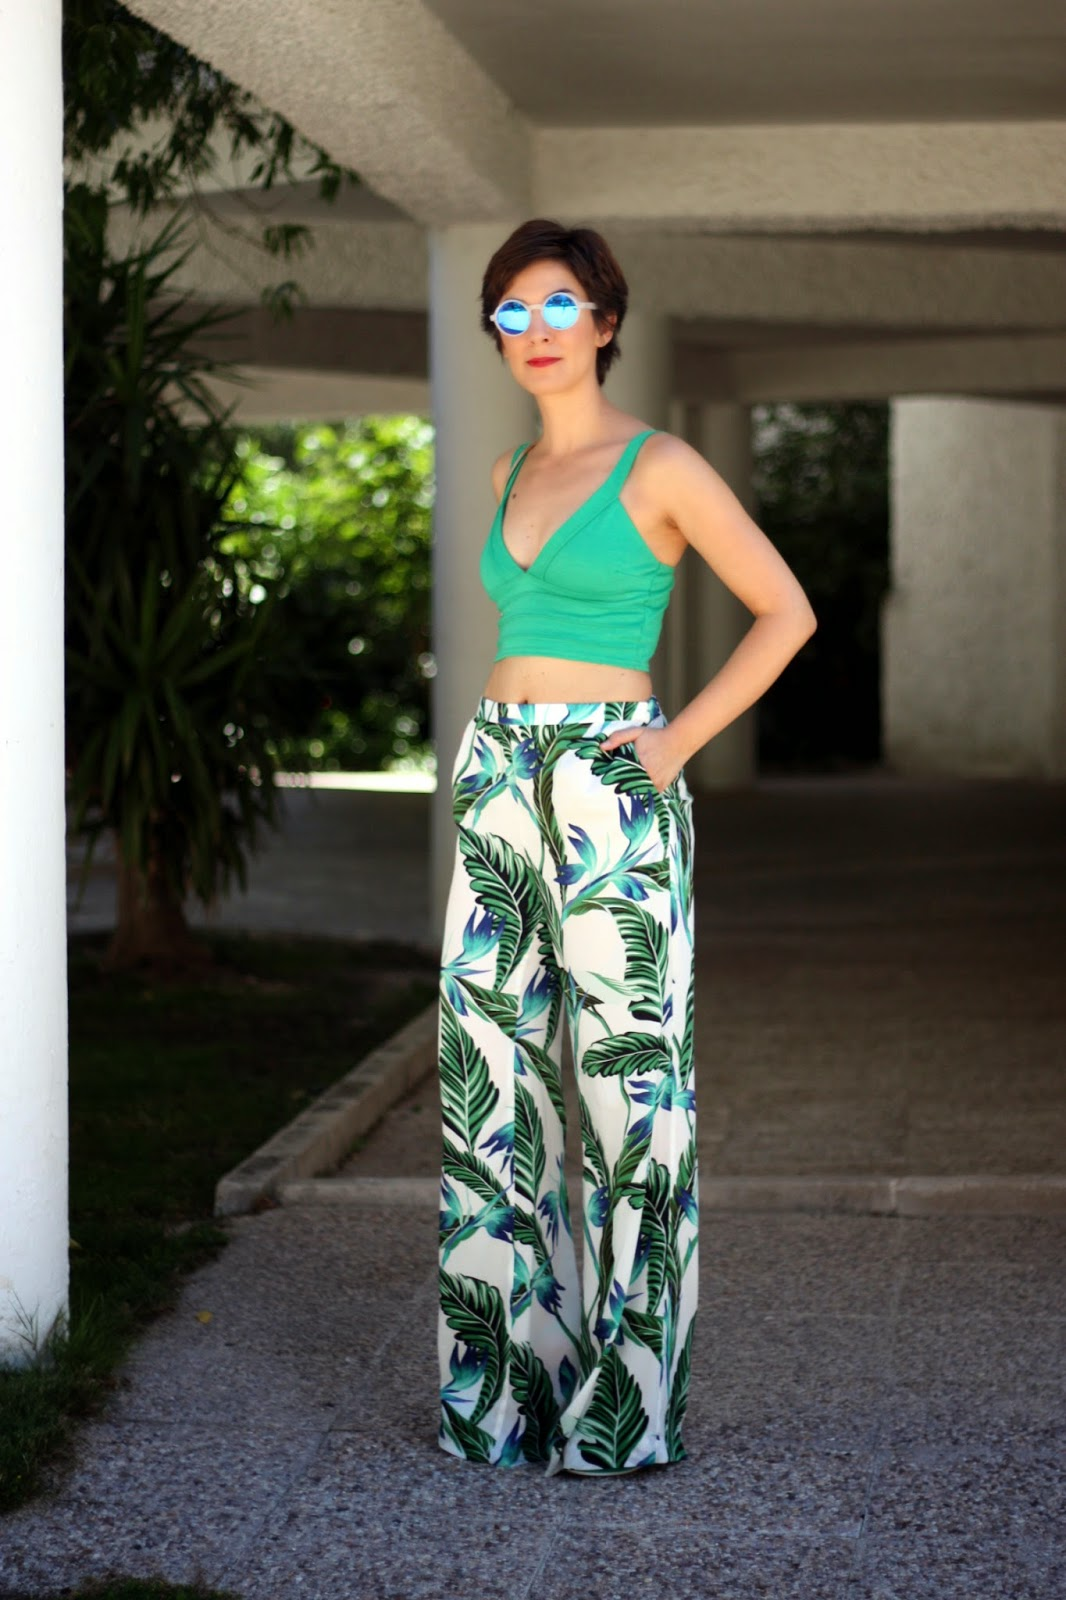 7a352401dc4a0 Combinar pantalon palazzo archivos oh blog JPG 1066x1600 Pantalón palazzo  cómo combinar tipo completo